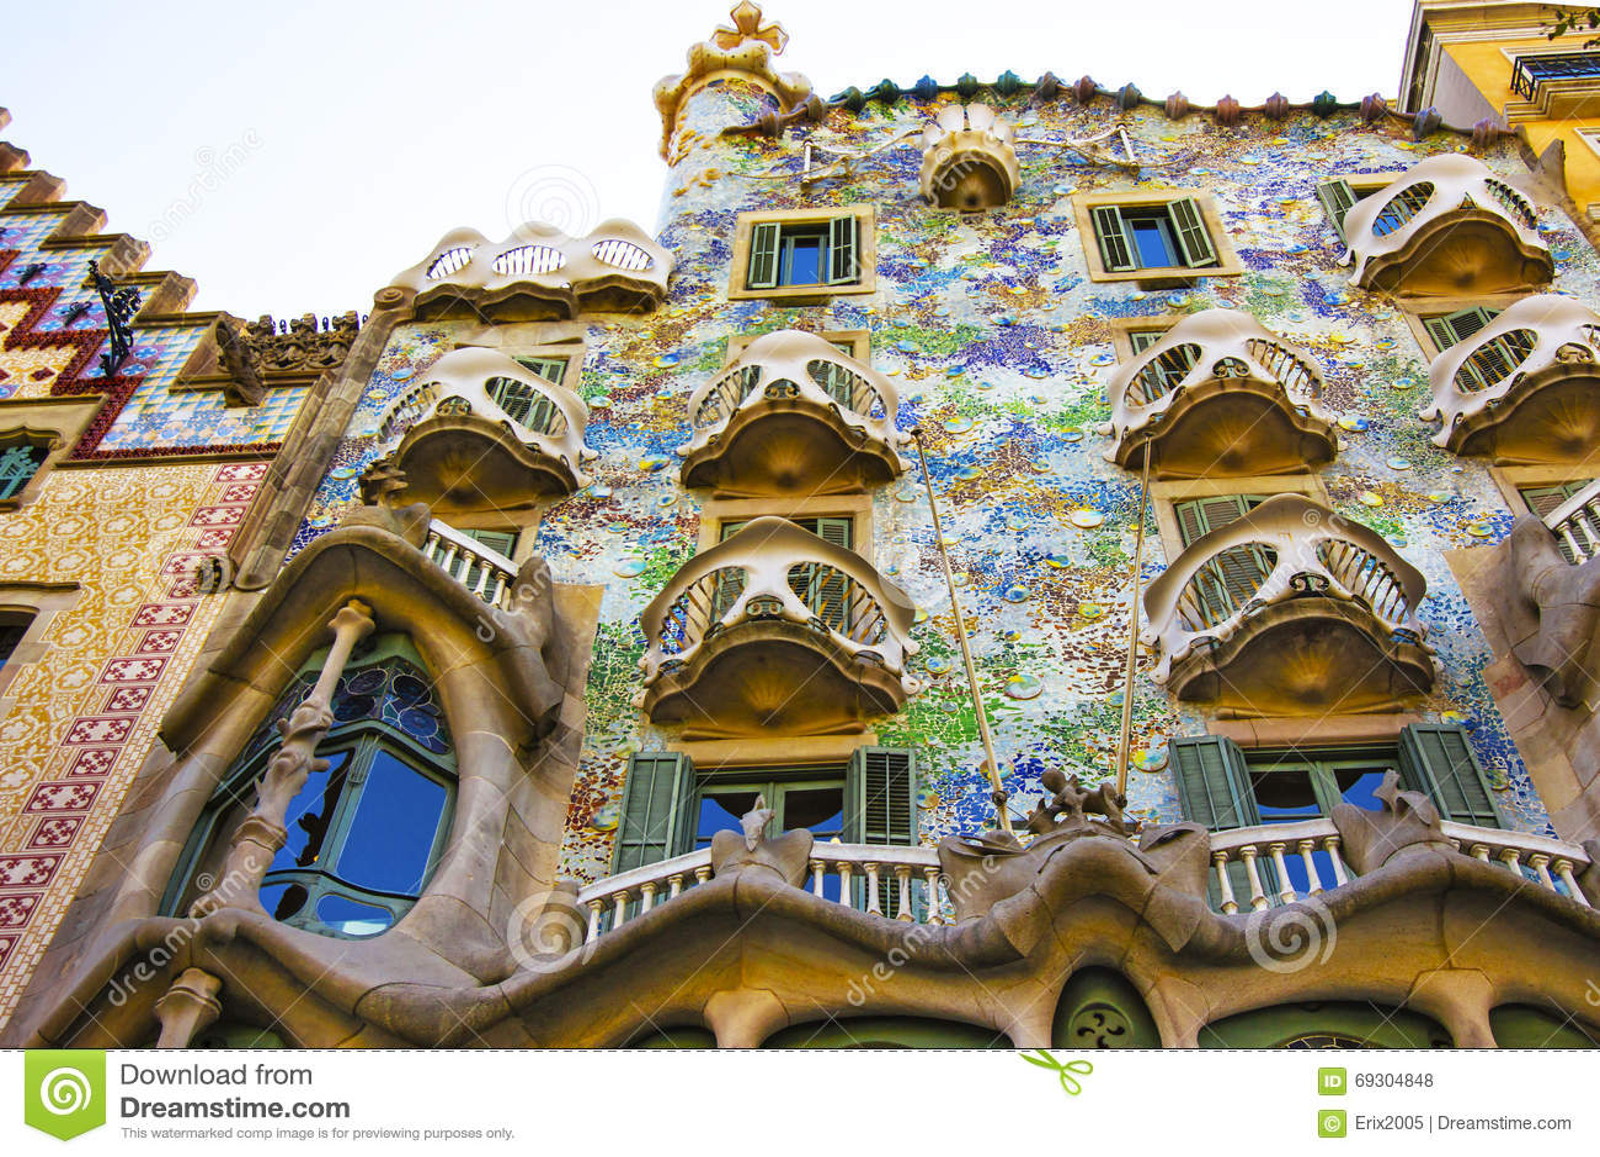 Balconies of Casa Batllo building in Barcelona in Spain